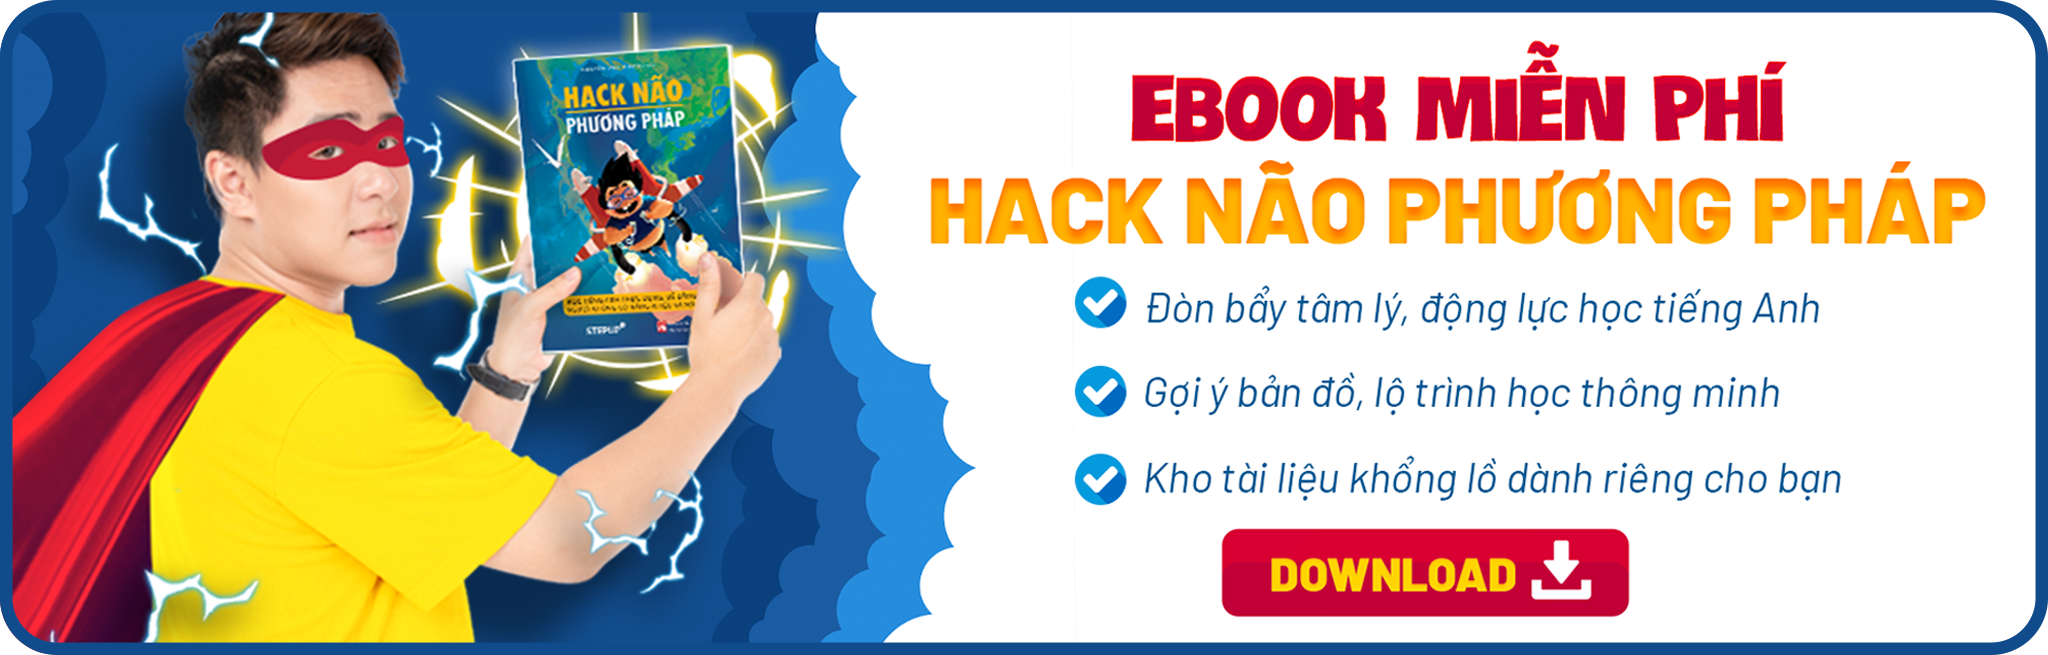 tải ebook hack não ngữ pháp